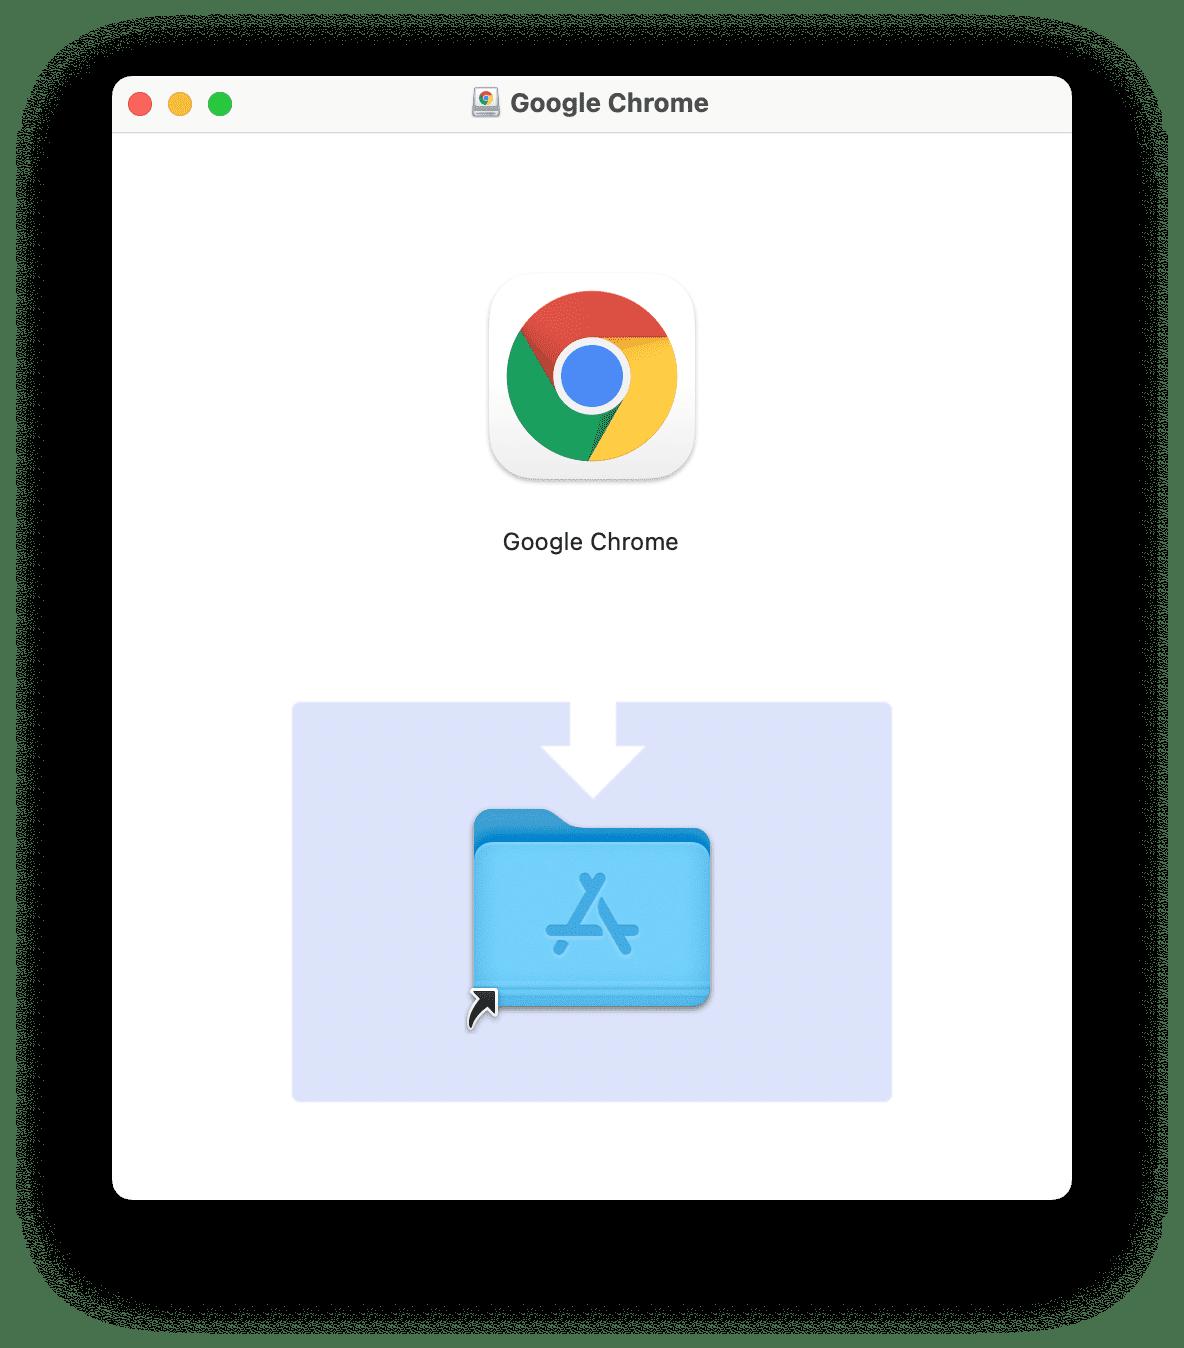 Chrome disk image